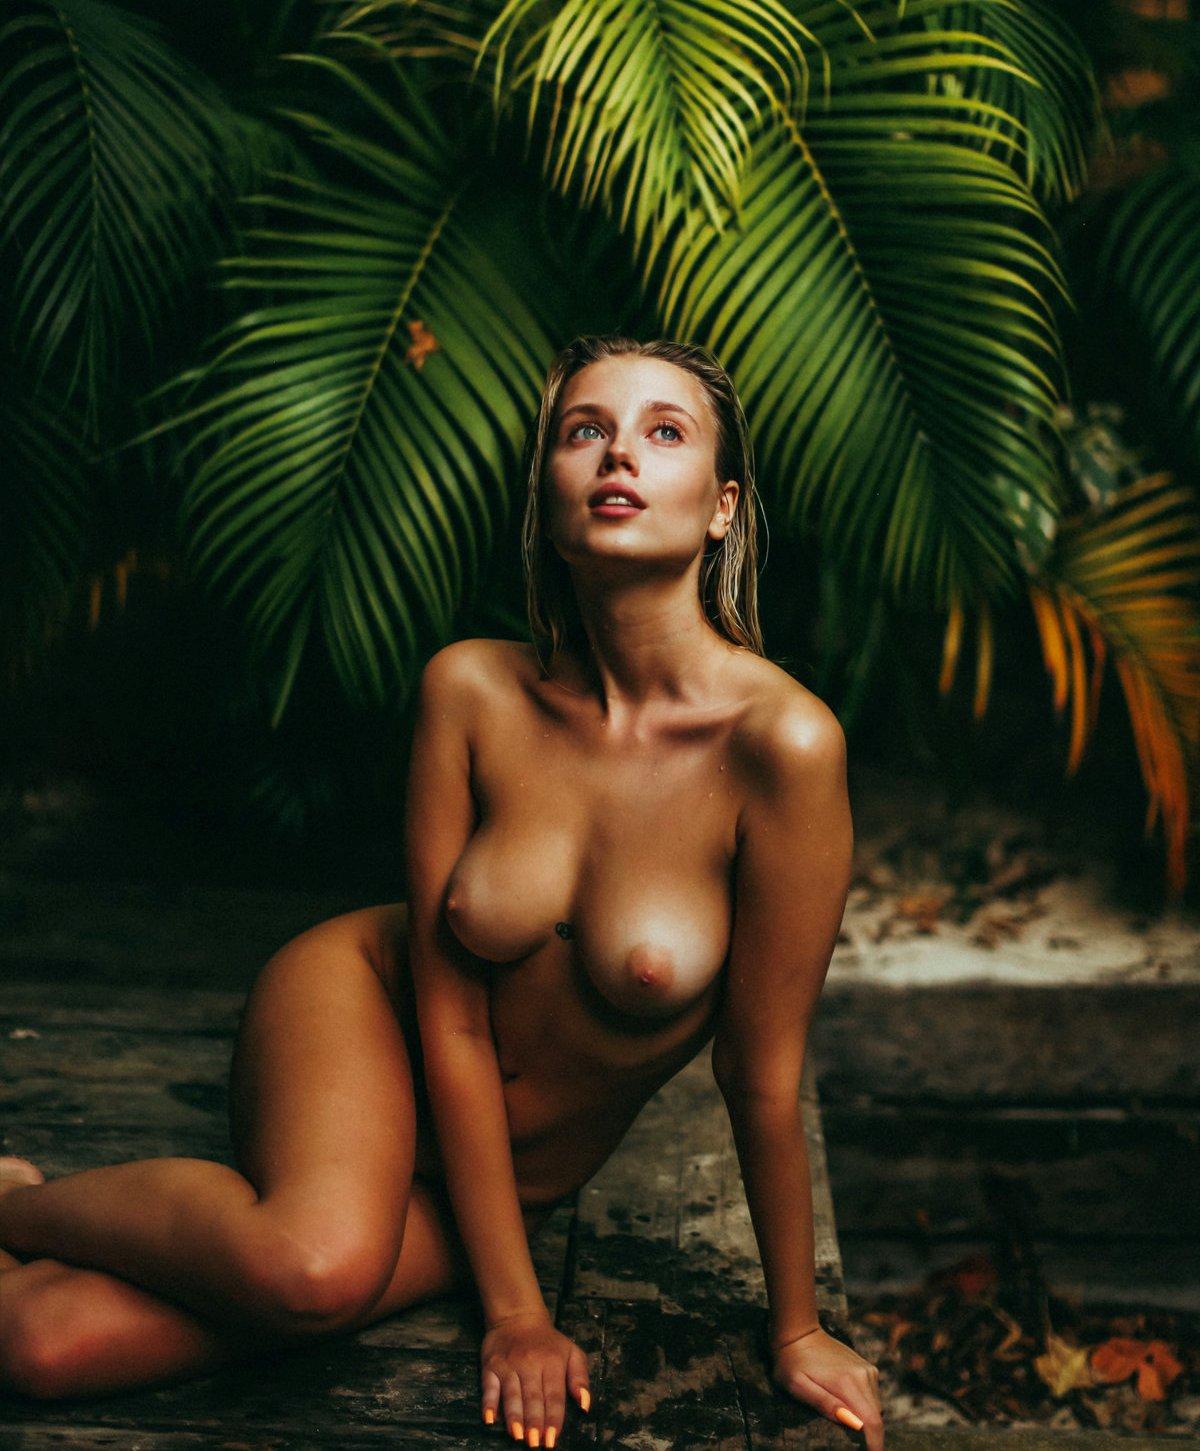 Polina Malinovskaya Polinamalinovskaya Instagram Nude Leaks 0021